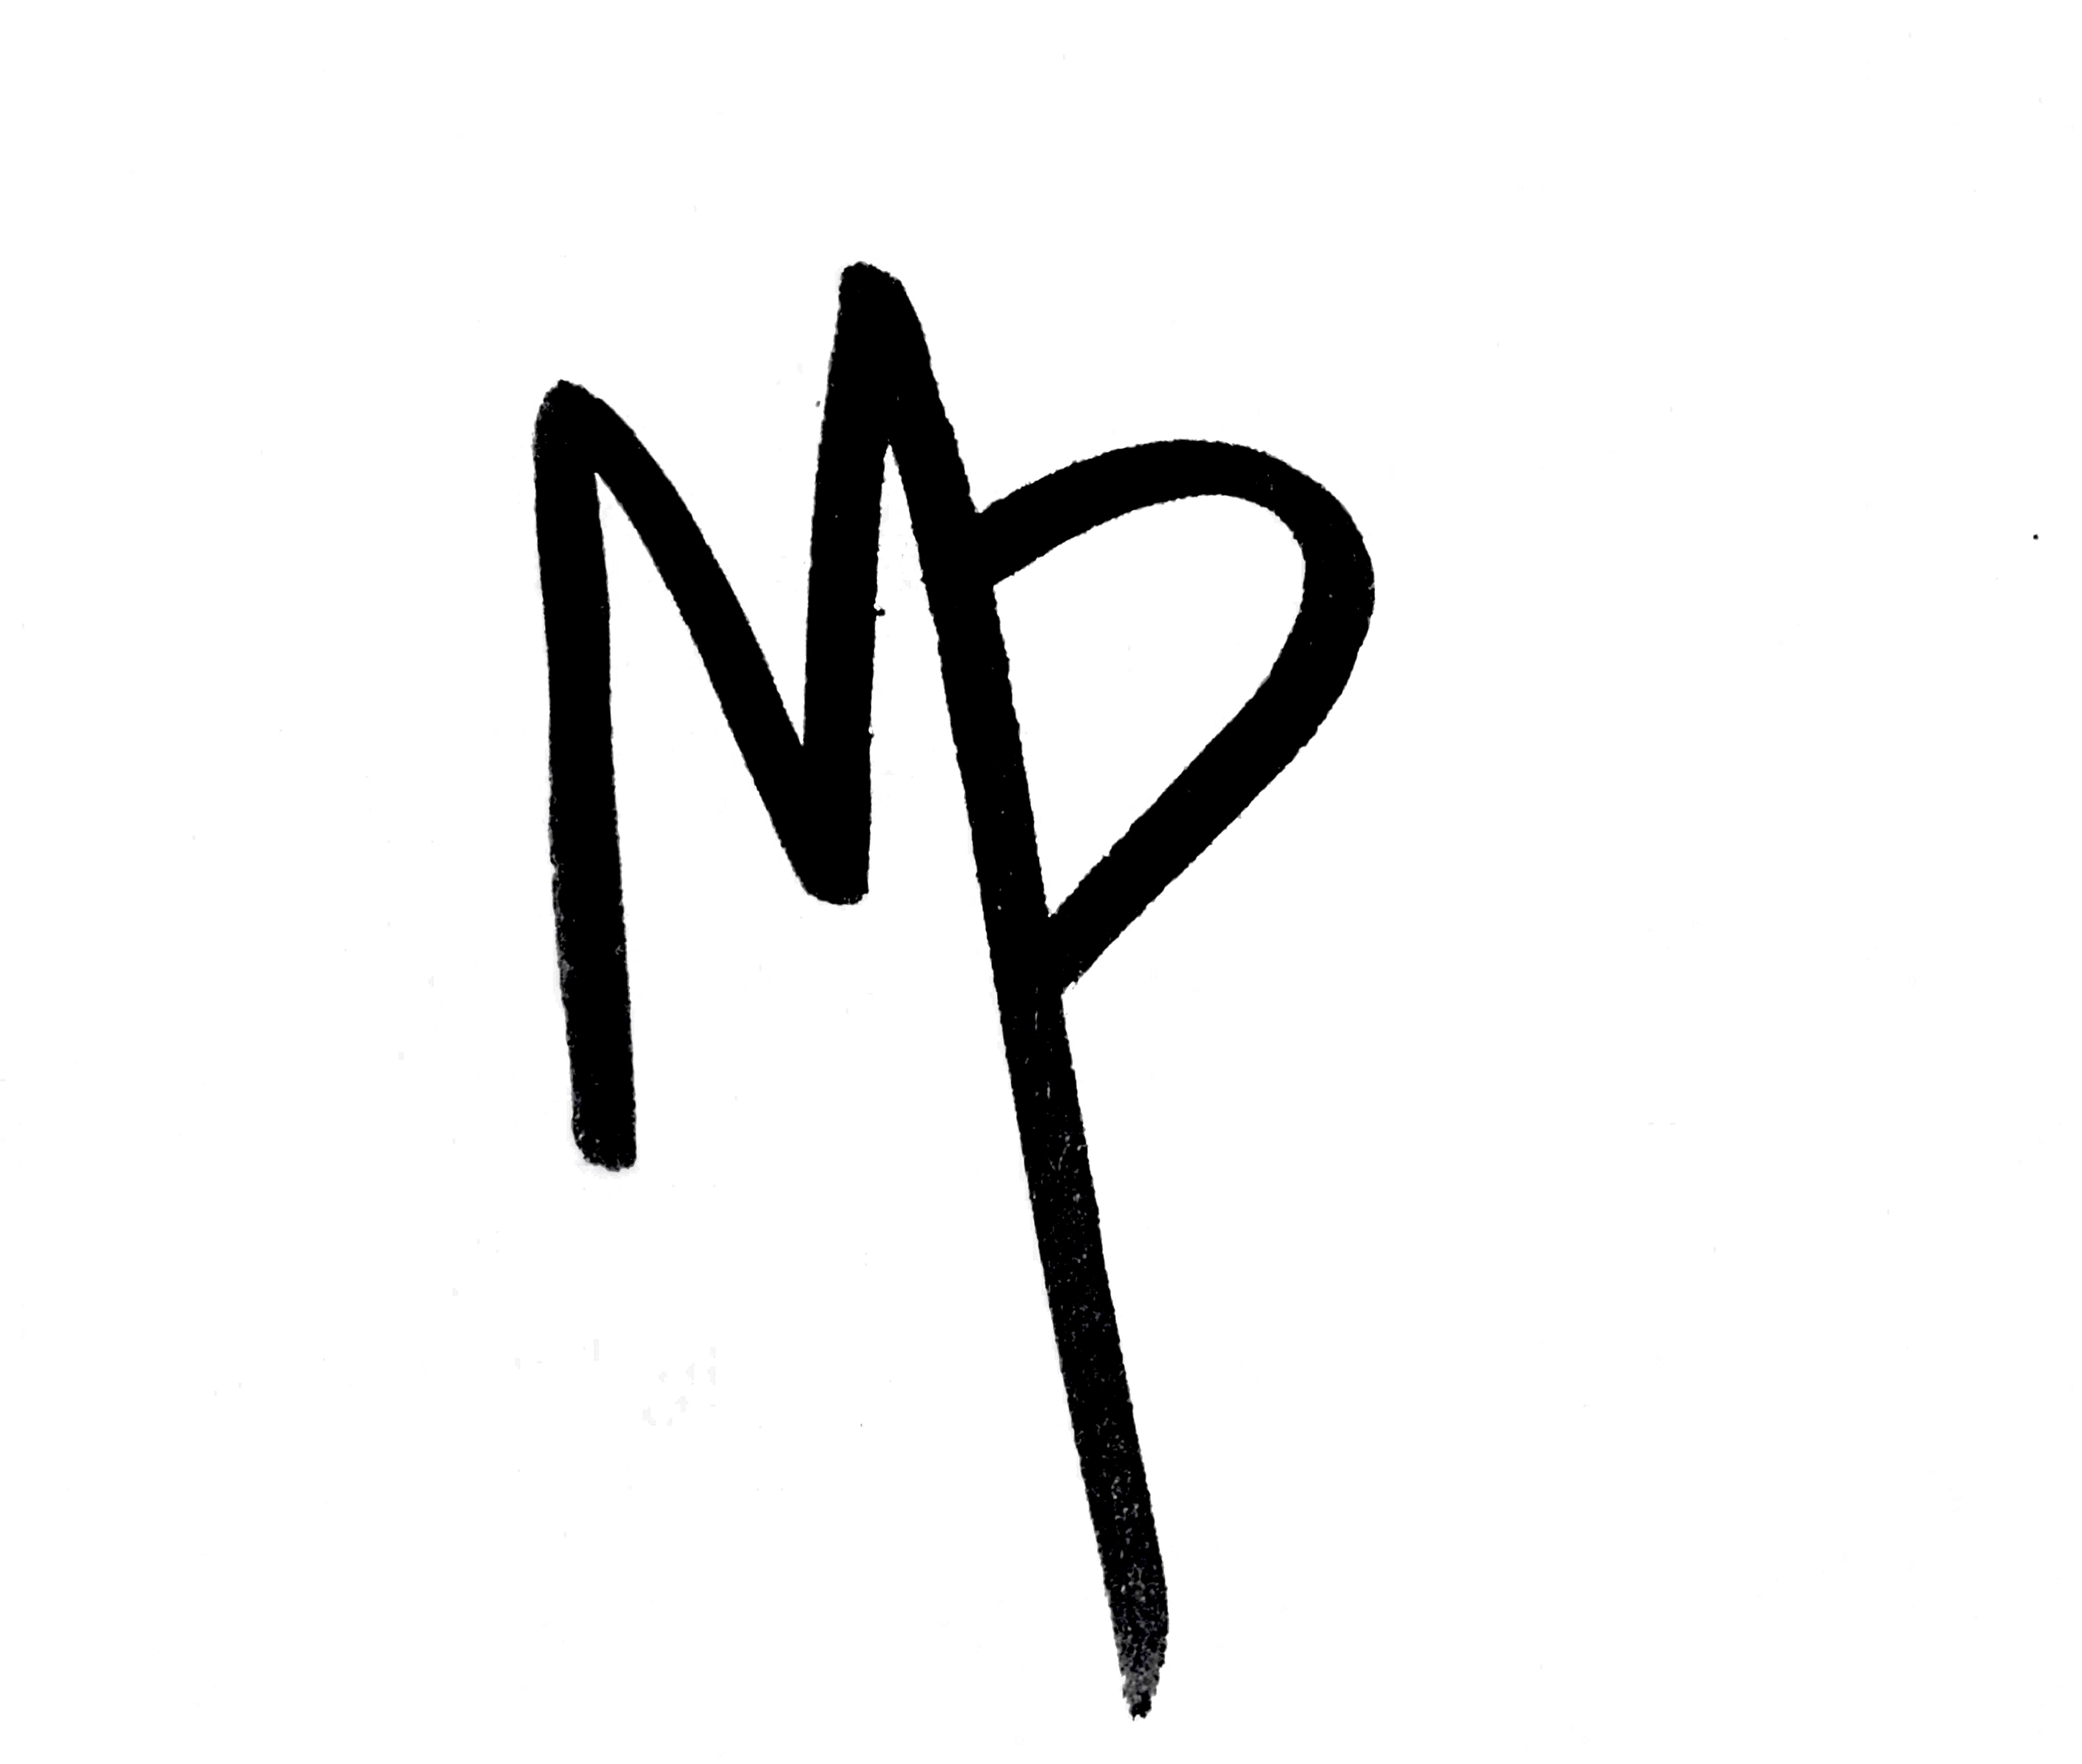 paula frança Signature